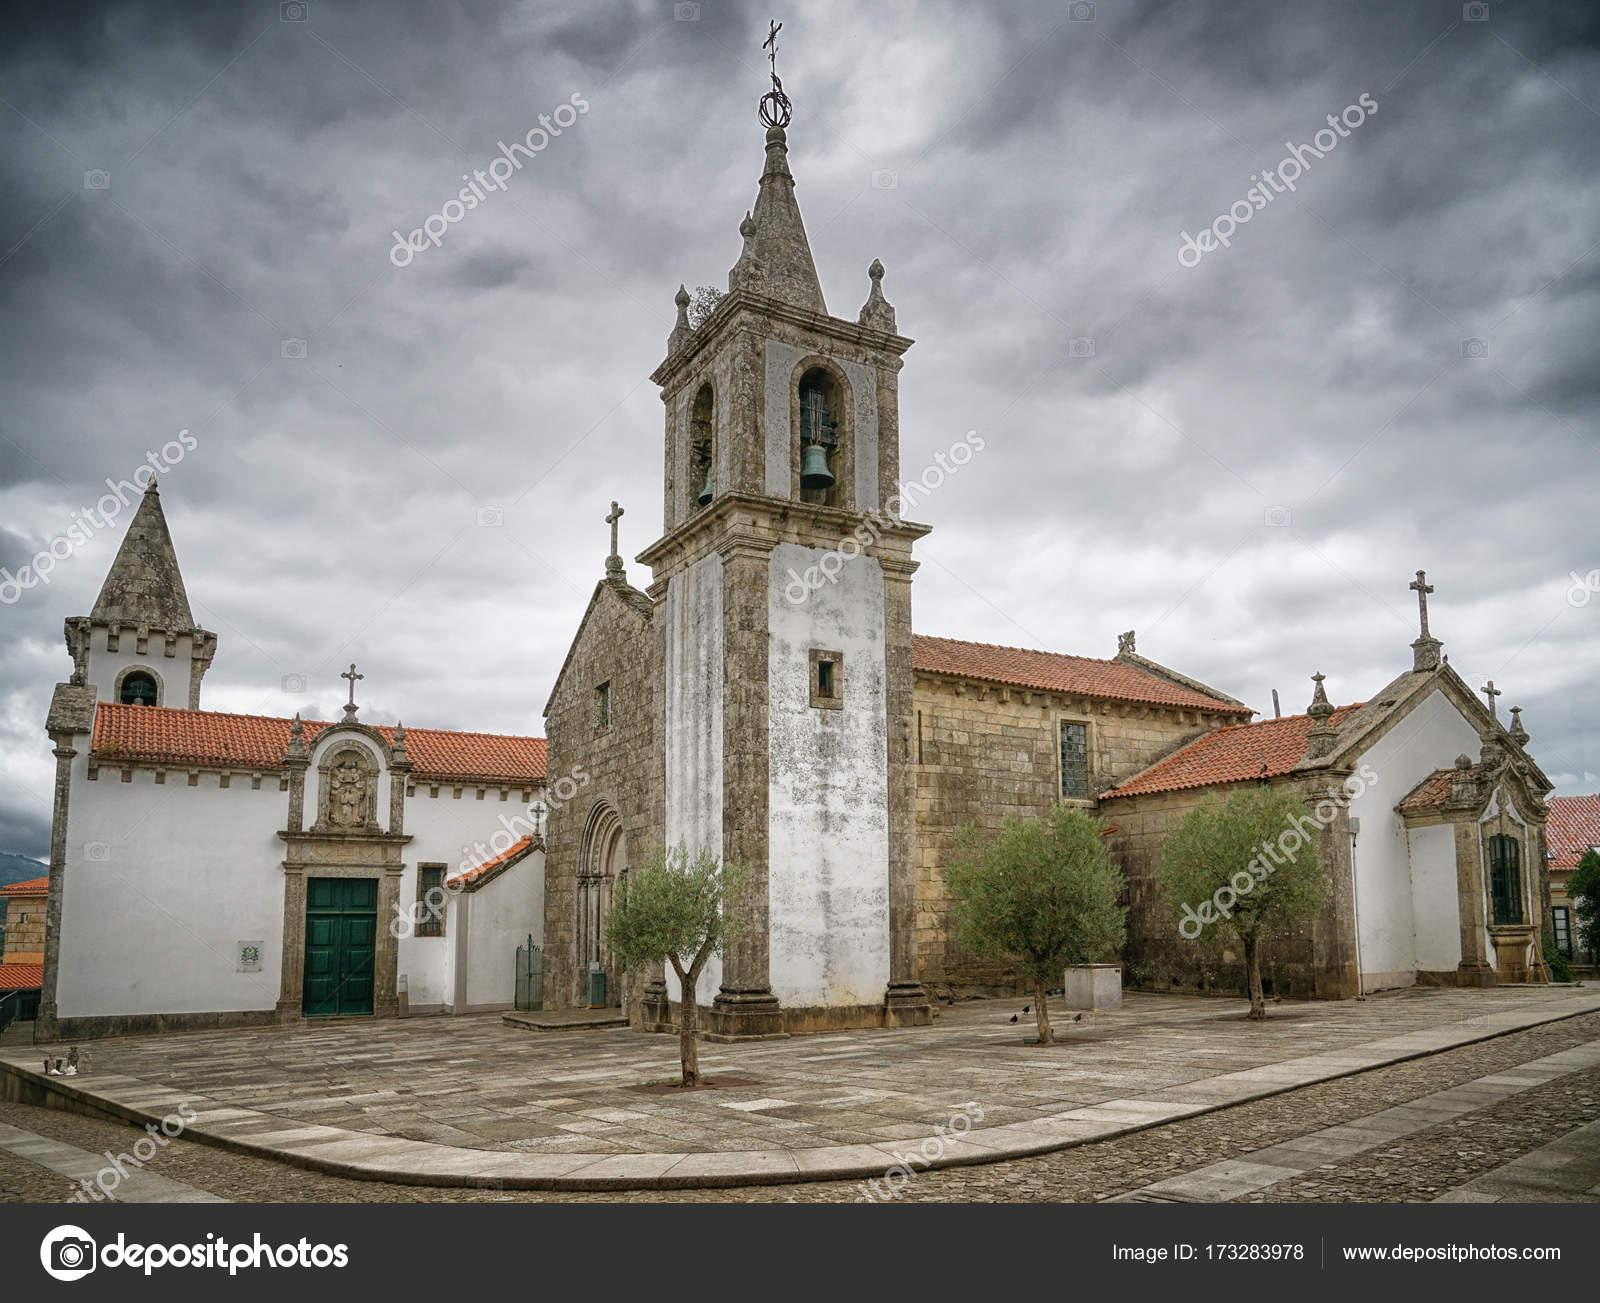 Valenca portugal europe foto de stock alfotokunst for Muebles portugal valenca